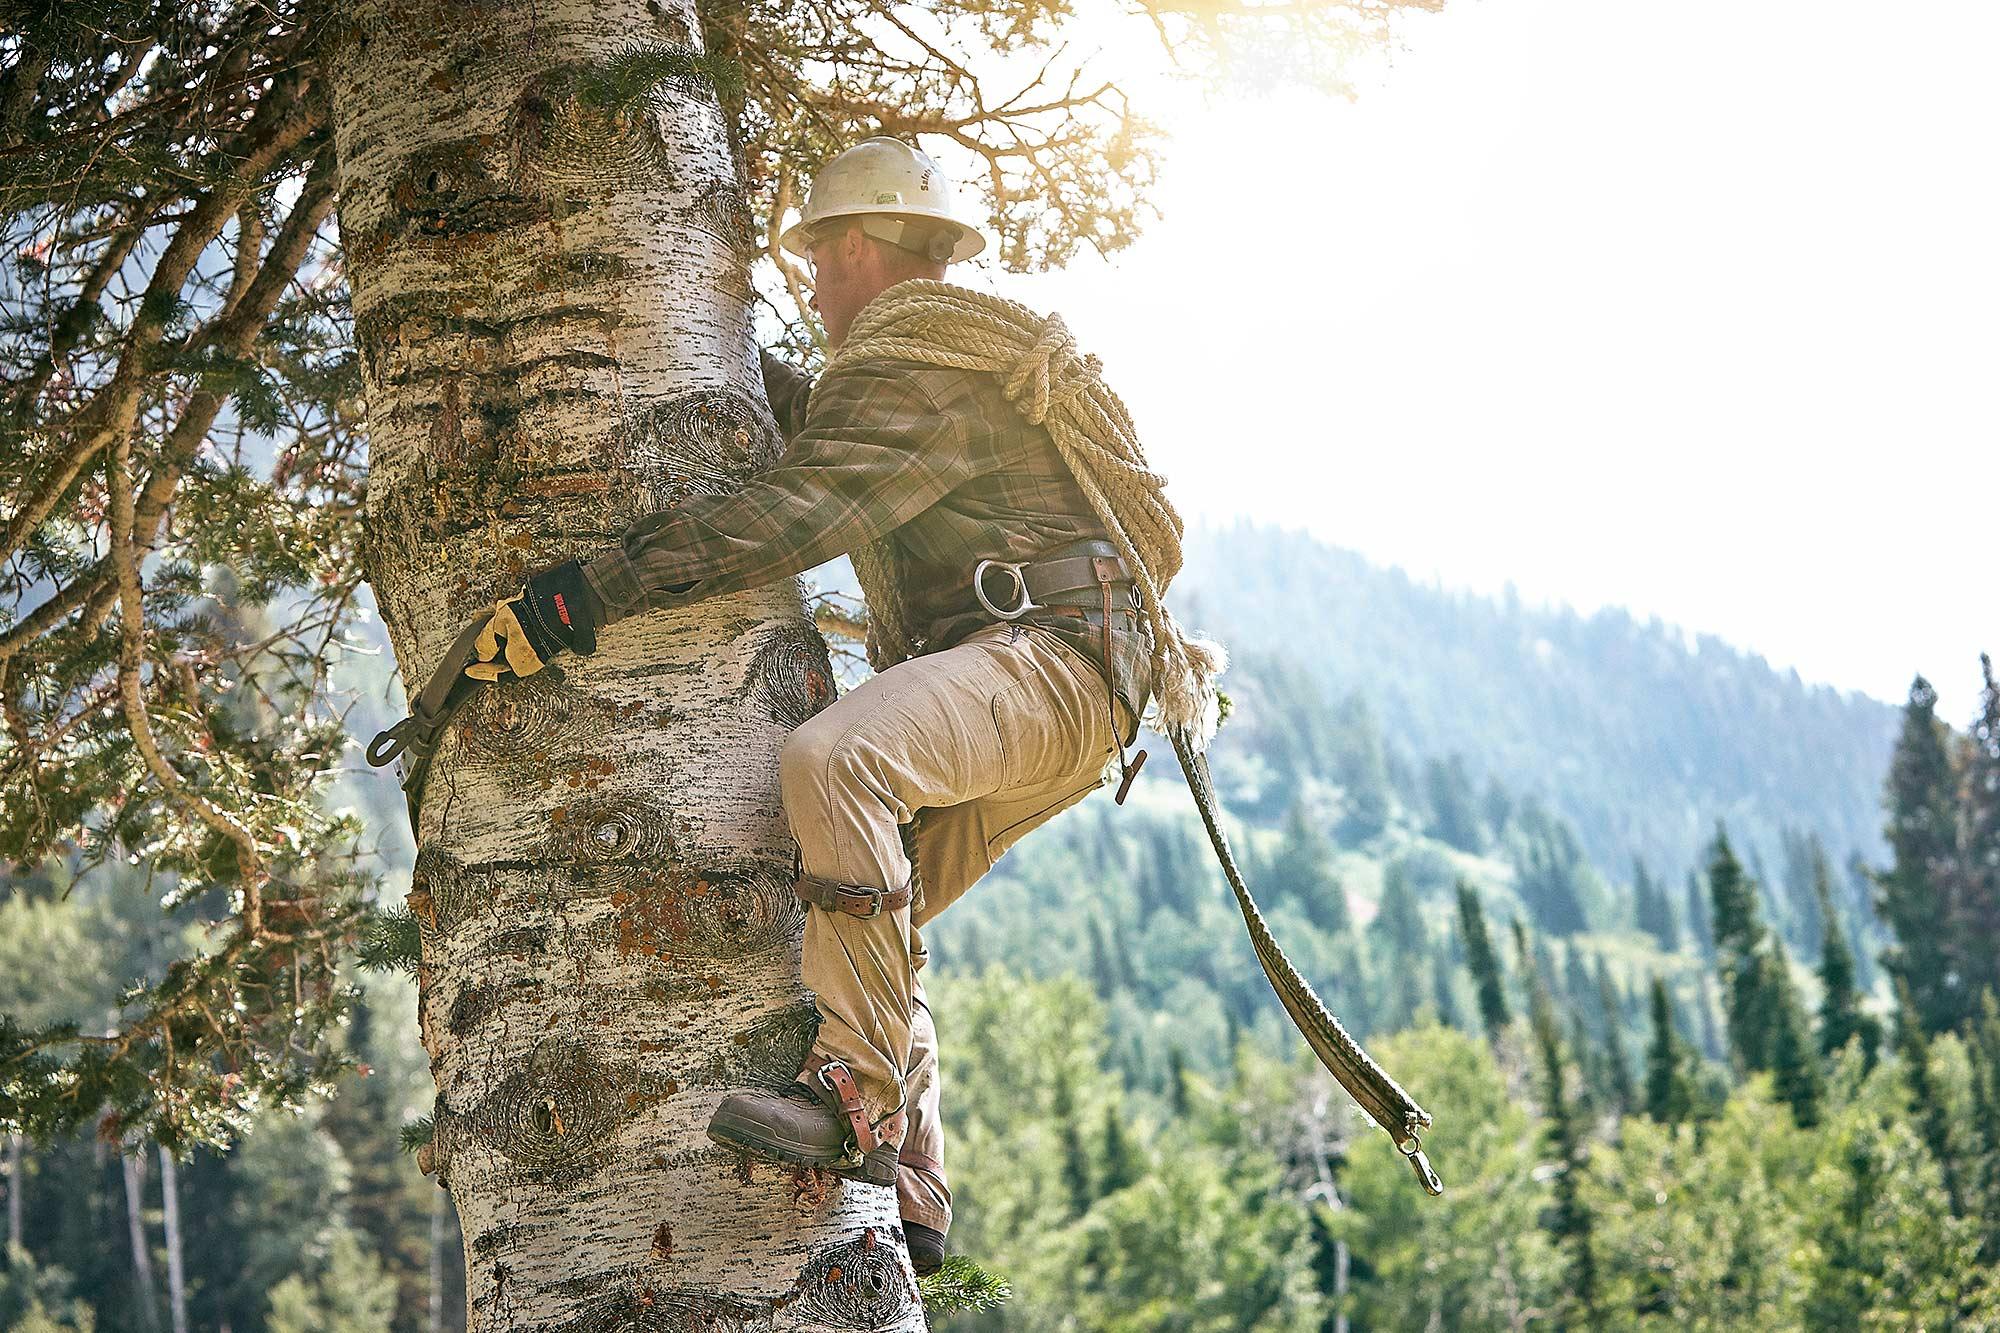 tree-climbing-Utah-Forestry-jeremy-frechette_HP.jpg